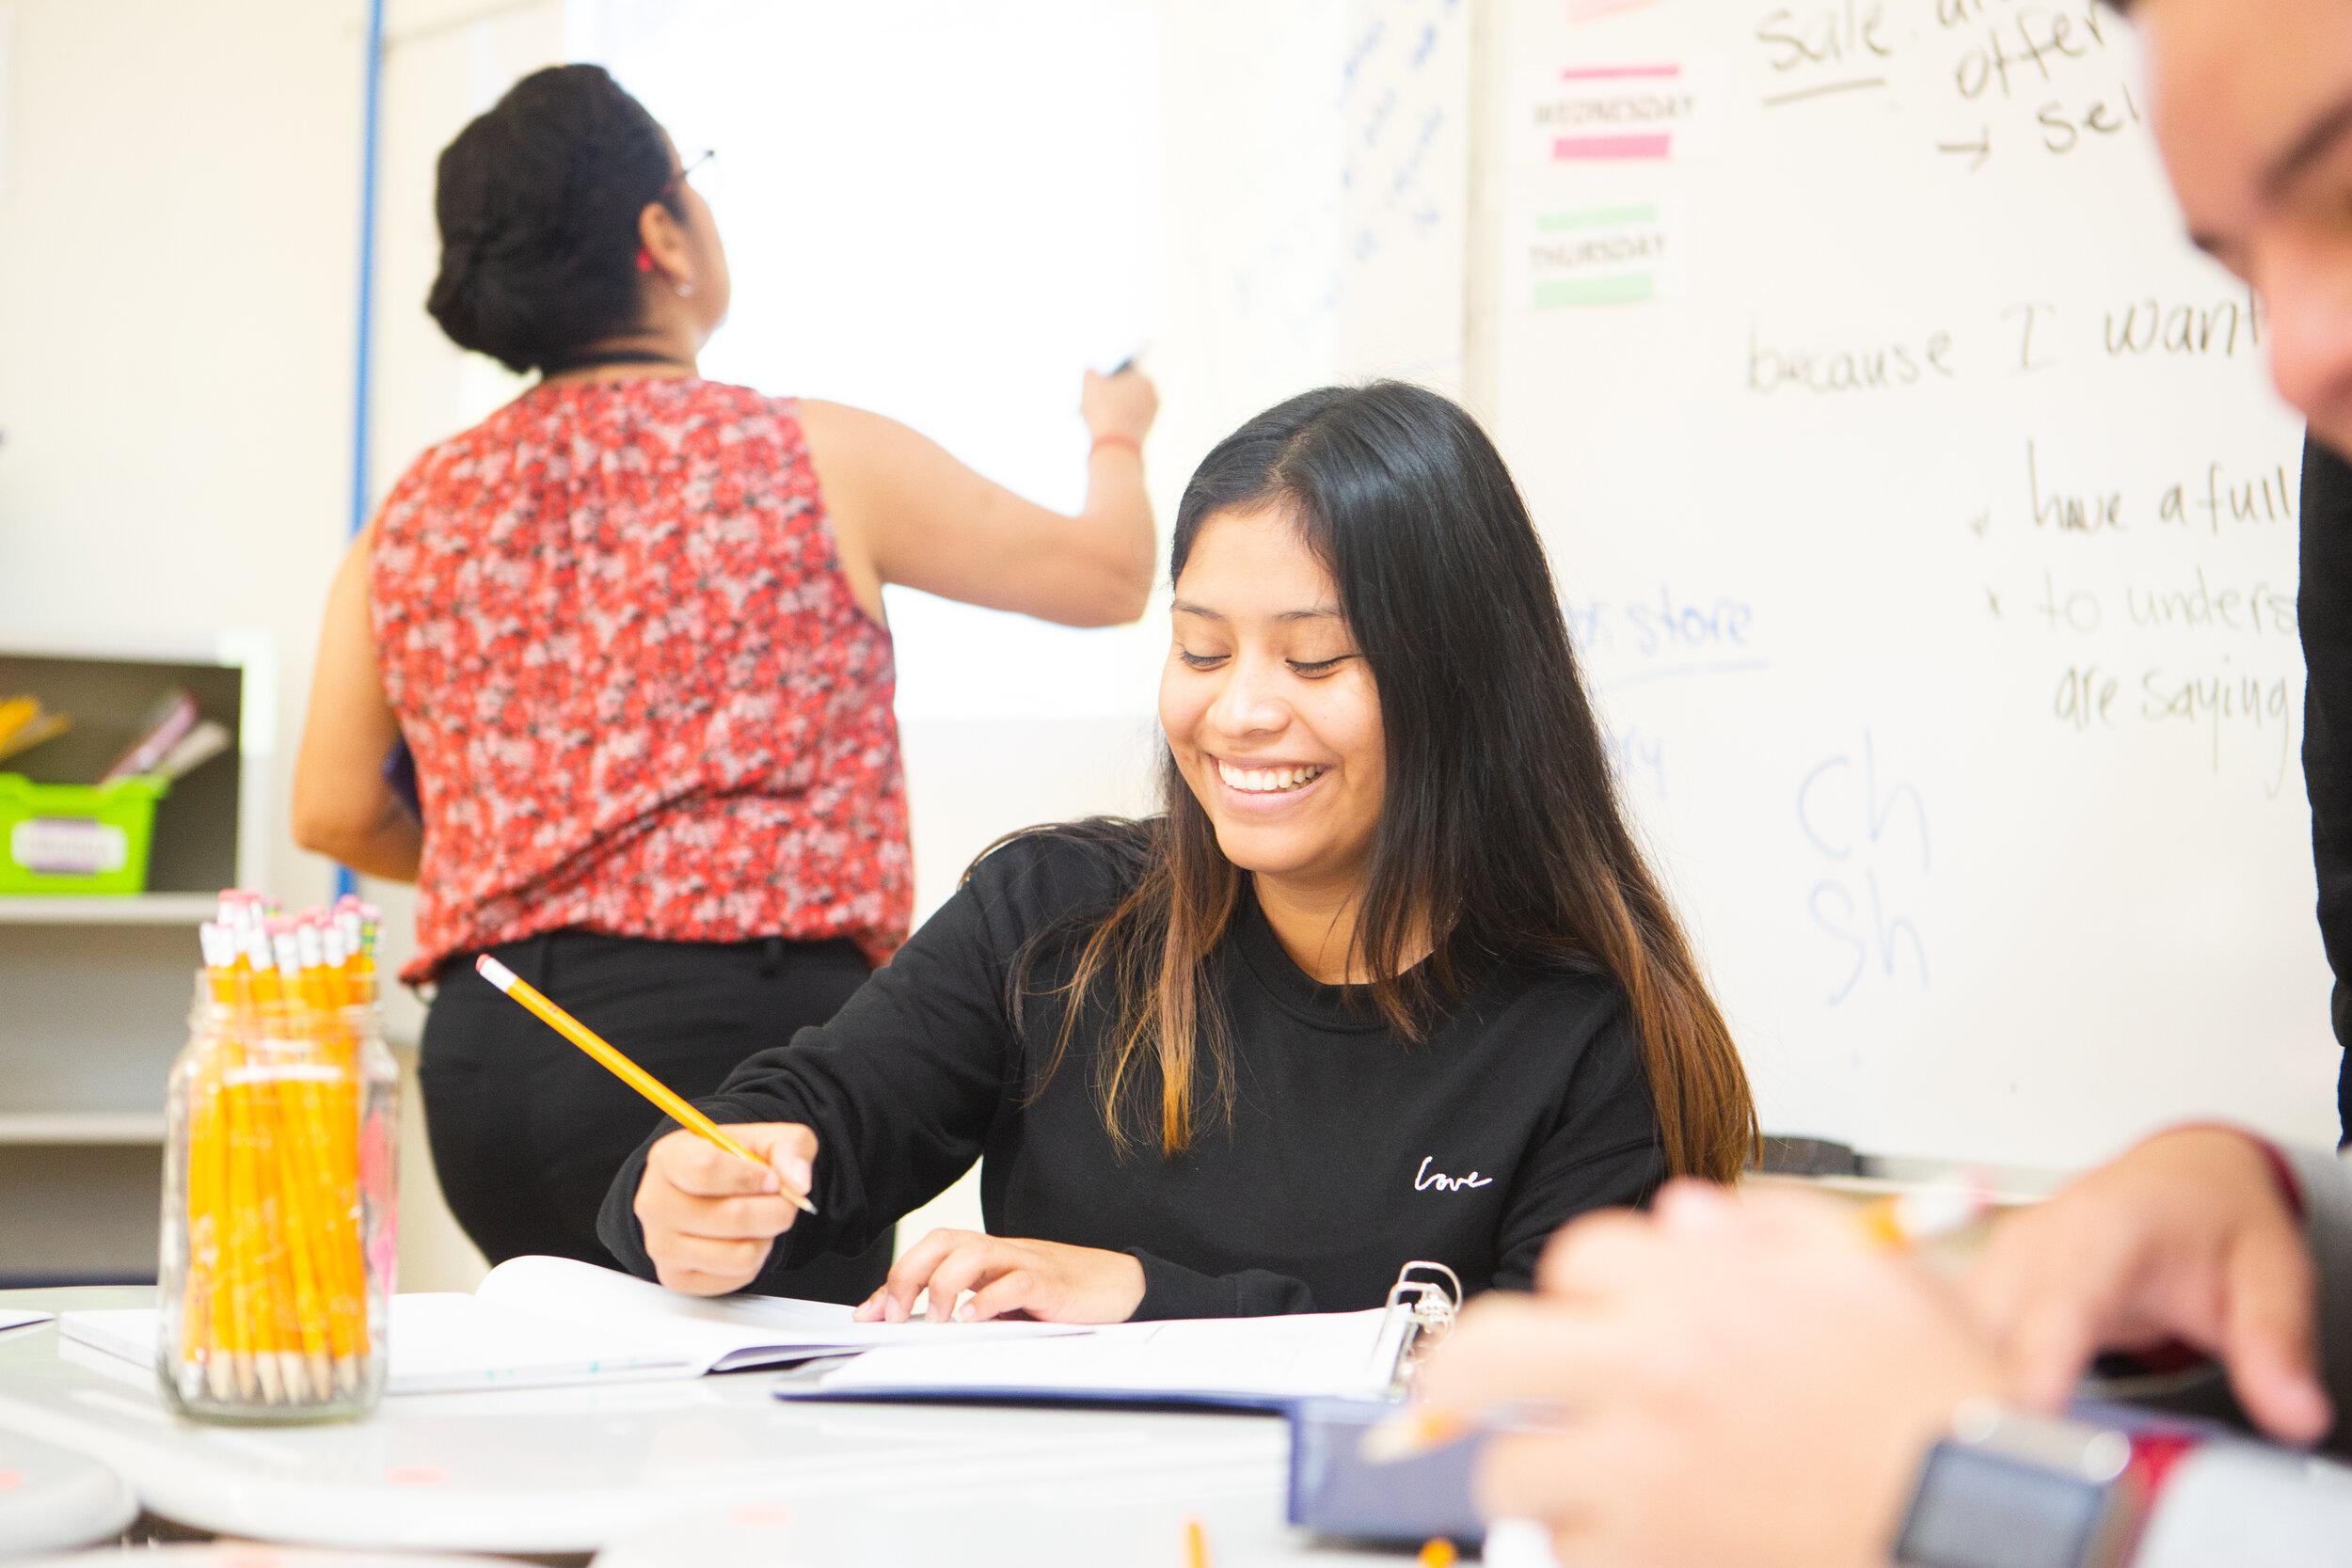 15:1 - Teacher : student ratio